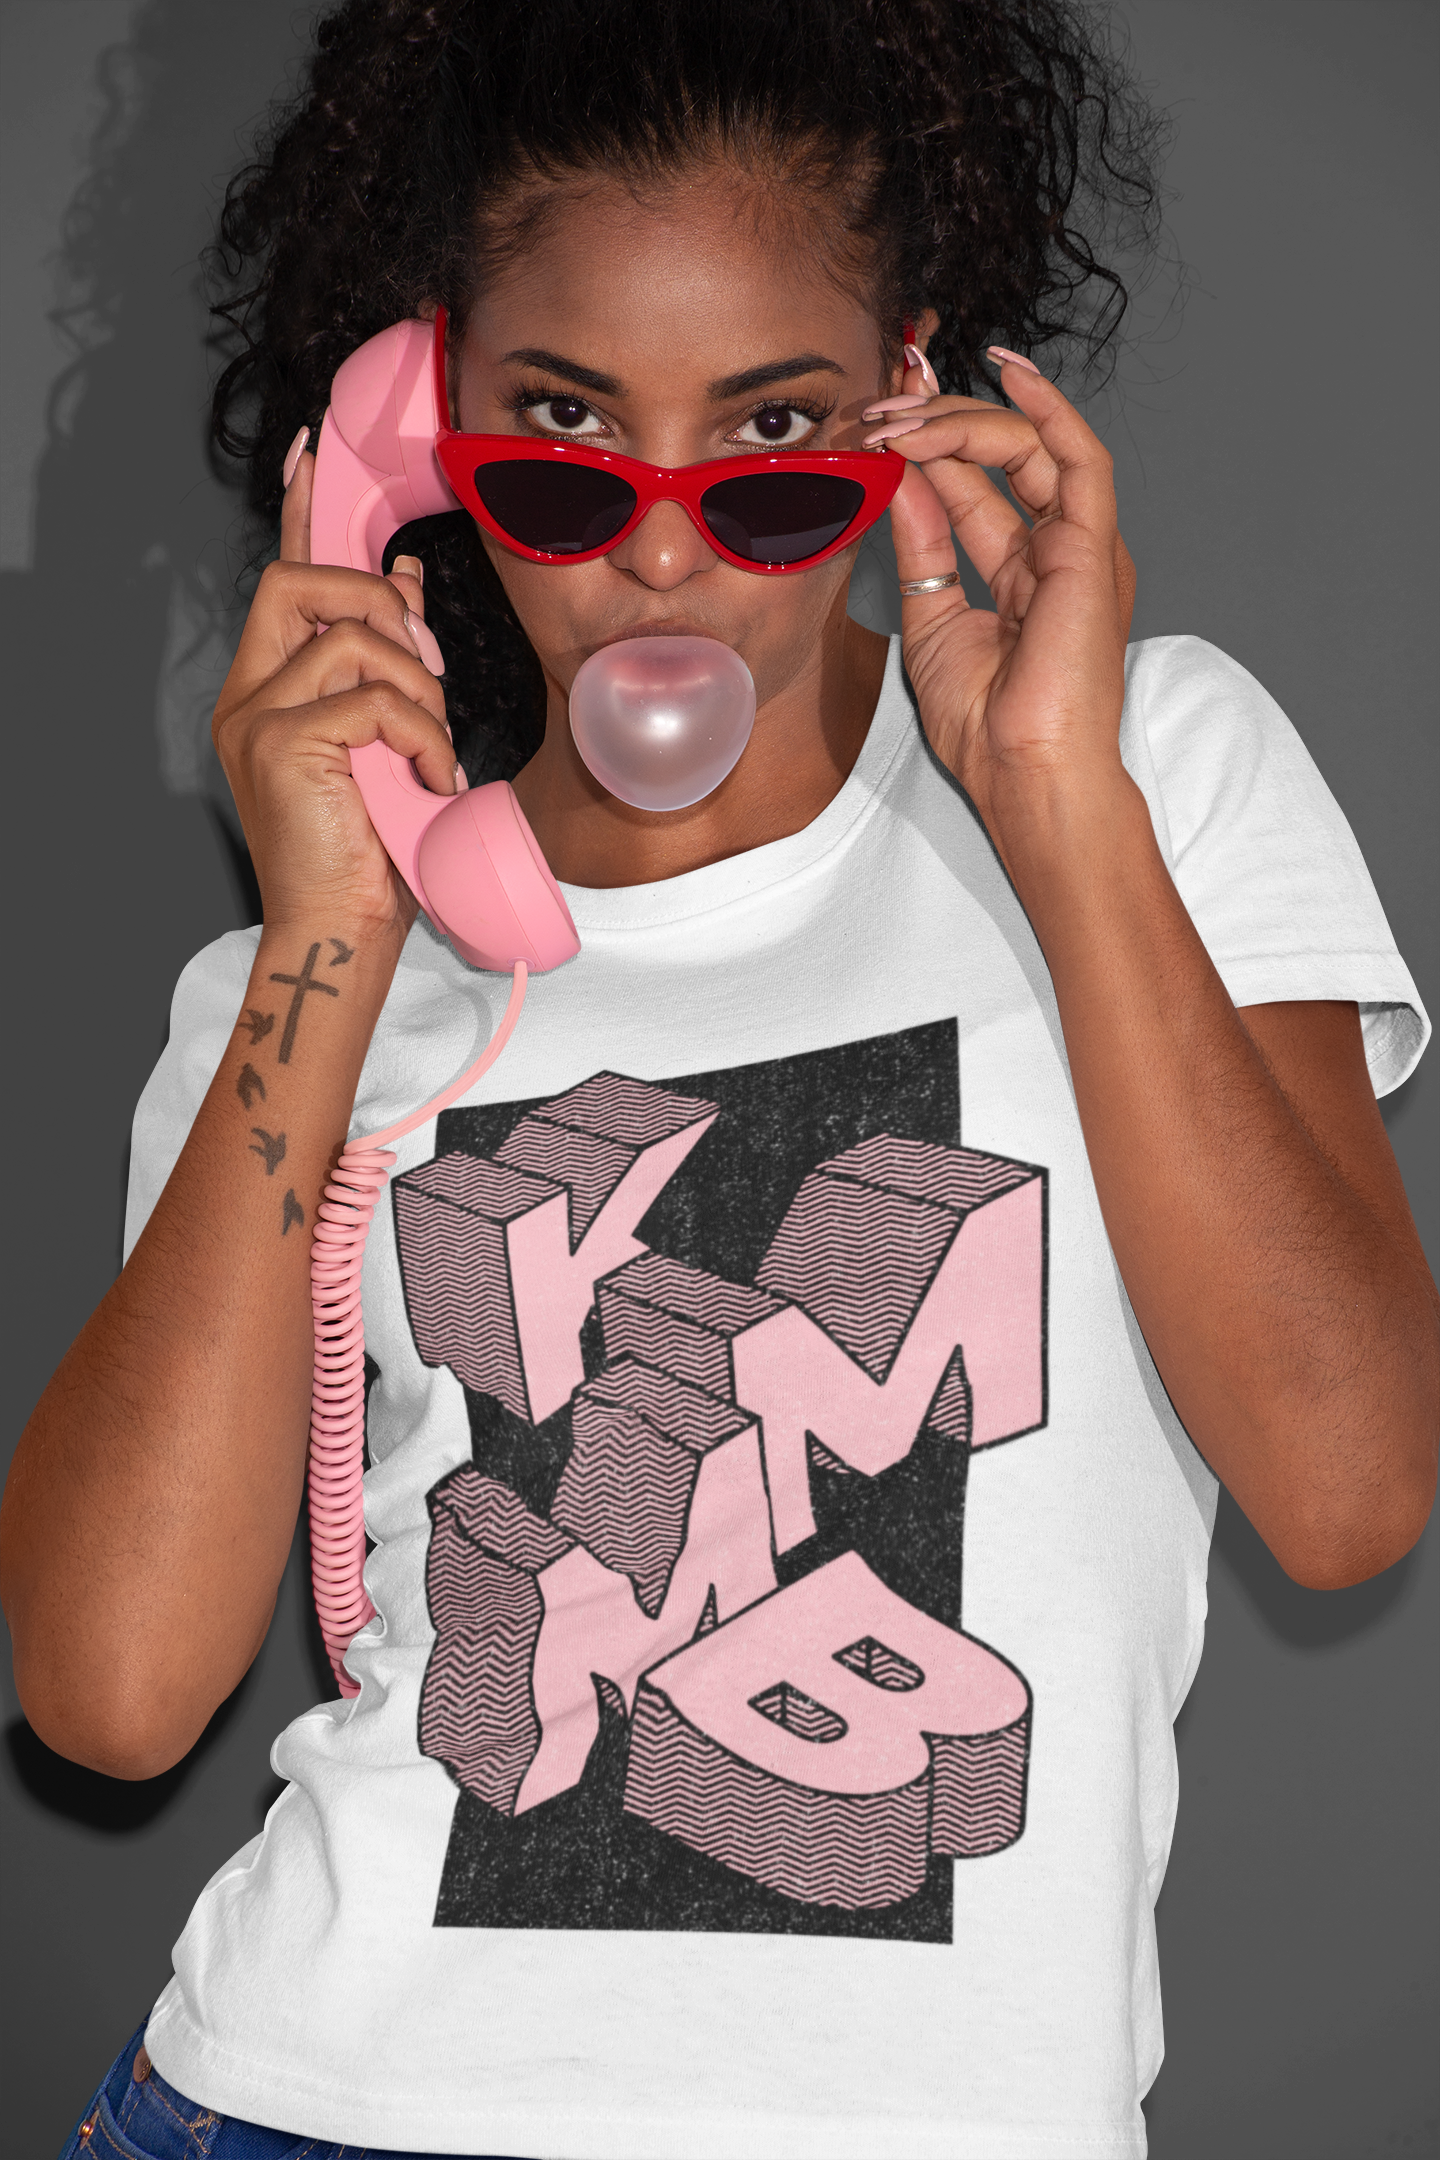 kmmb shirt